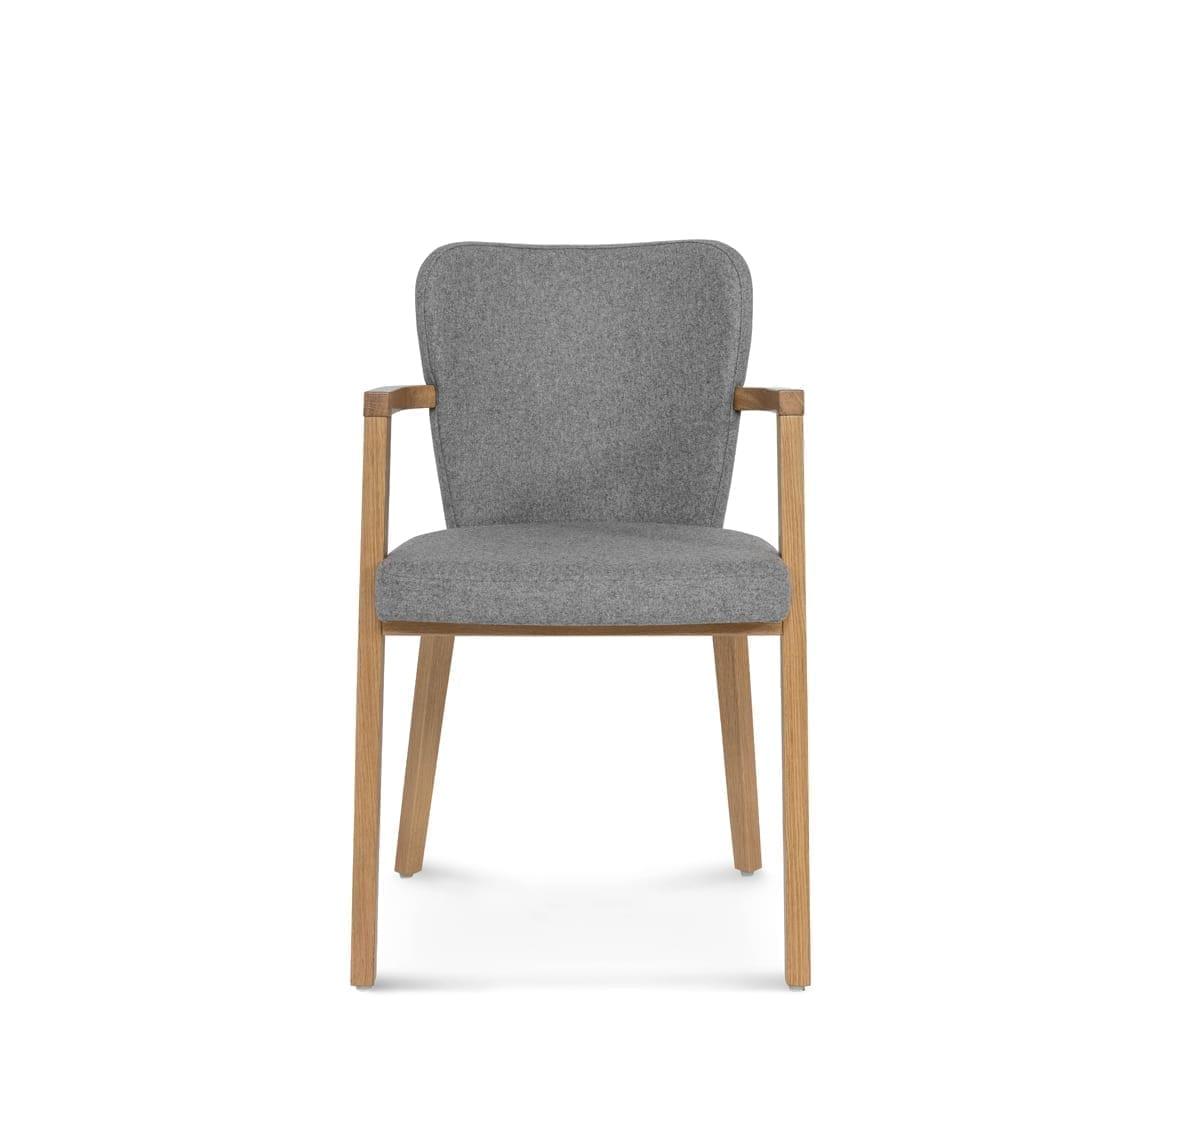 Fameg_krzesło_B-1807_lava_1